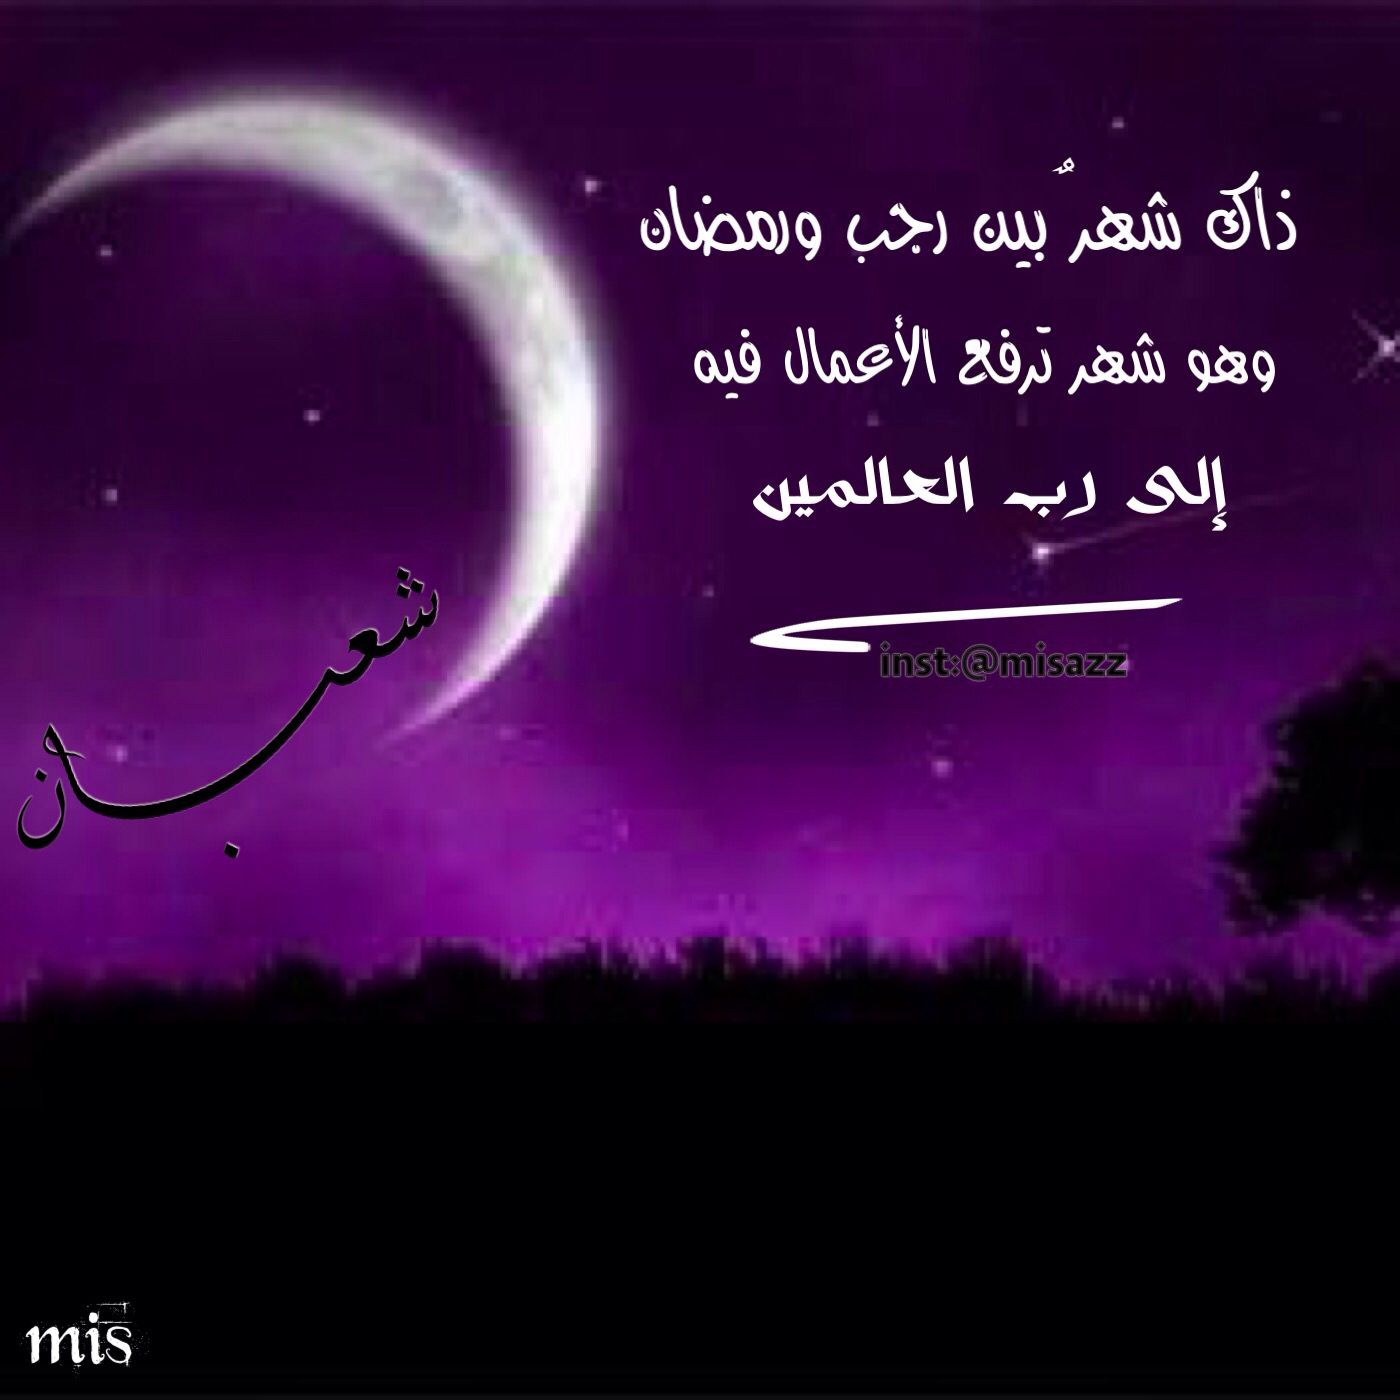 اللهم بارك لنا فيه شعبان وبلغنا رمضان Movie Posters Poster Movies